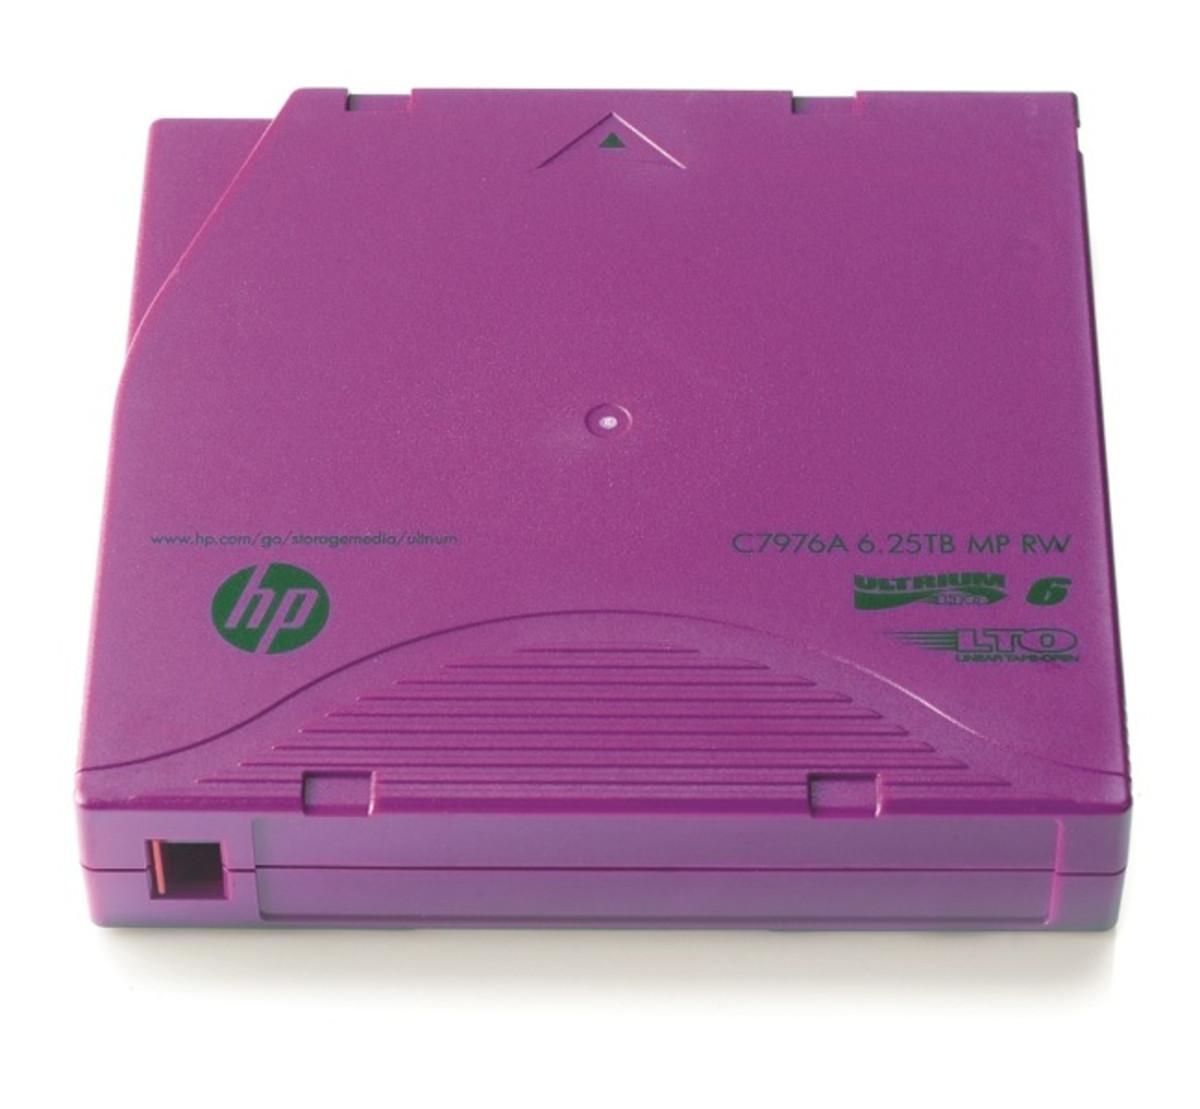 HP LTO6 Ultrium 6.25TB RW Data Cartridge (C7976A)